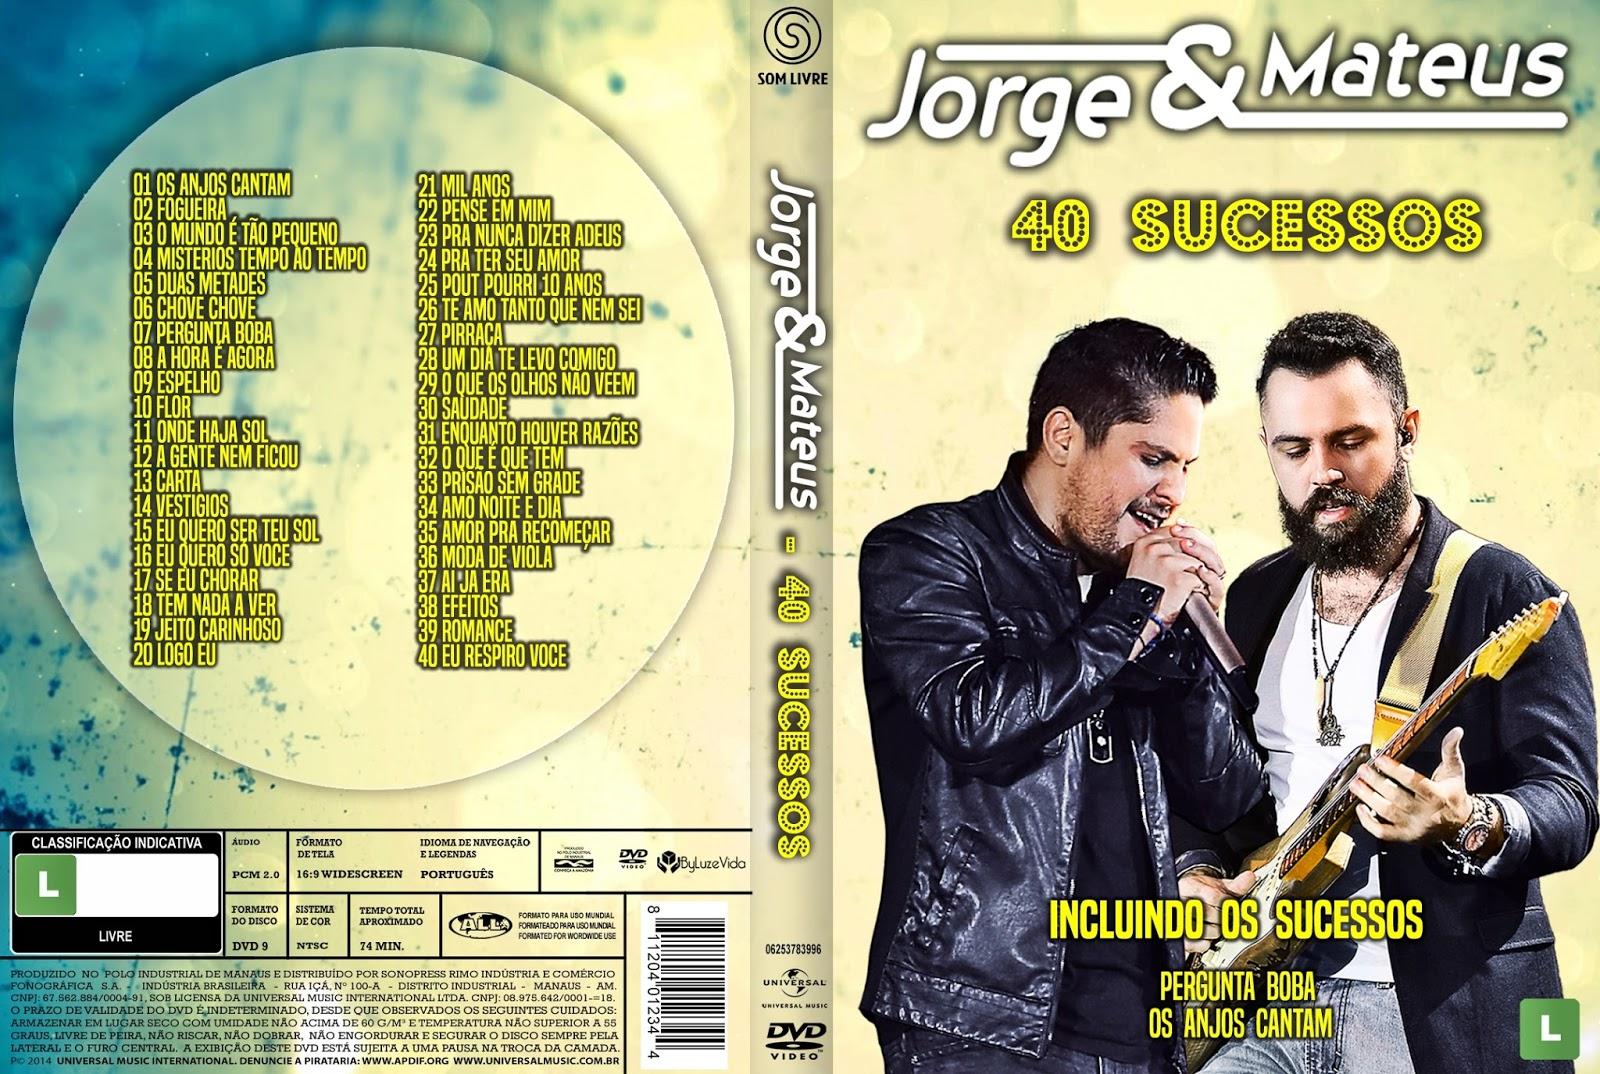 Jorge & Mateus 40 Sucessos DVDRip XviD 2016 Jorge 2B 2526 2BMateus 2B40 2BSucessos 2BDVD R 2BXANDAODOWNLOAD